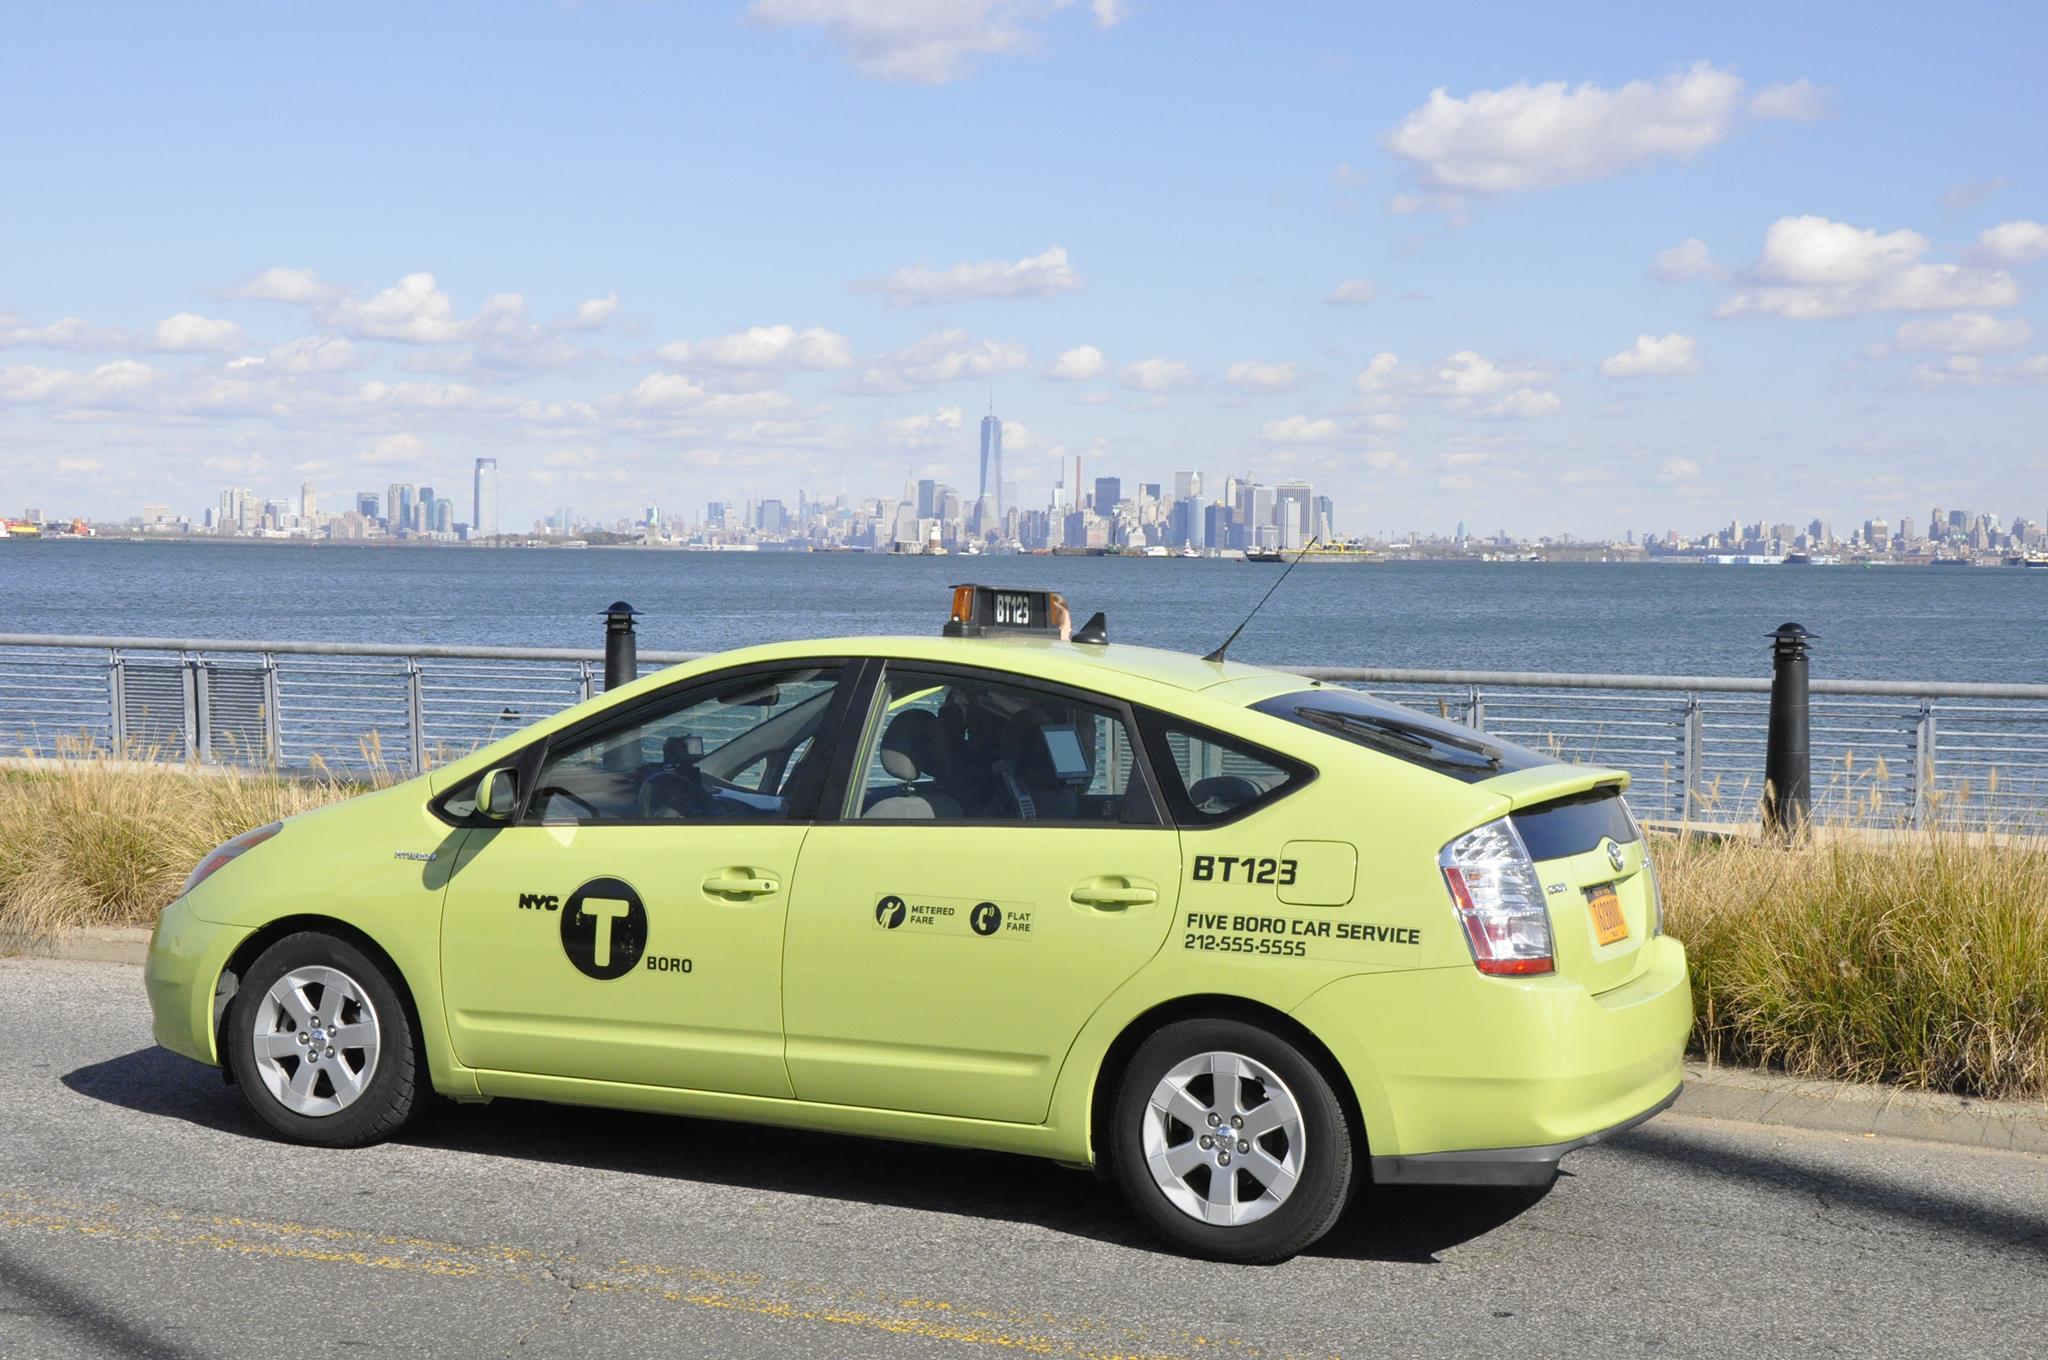 Staten Island Cabs